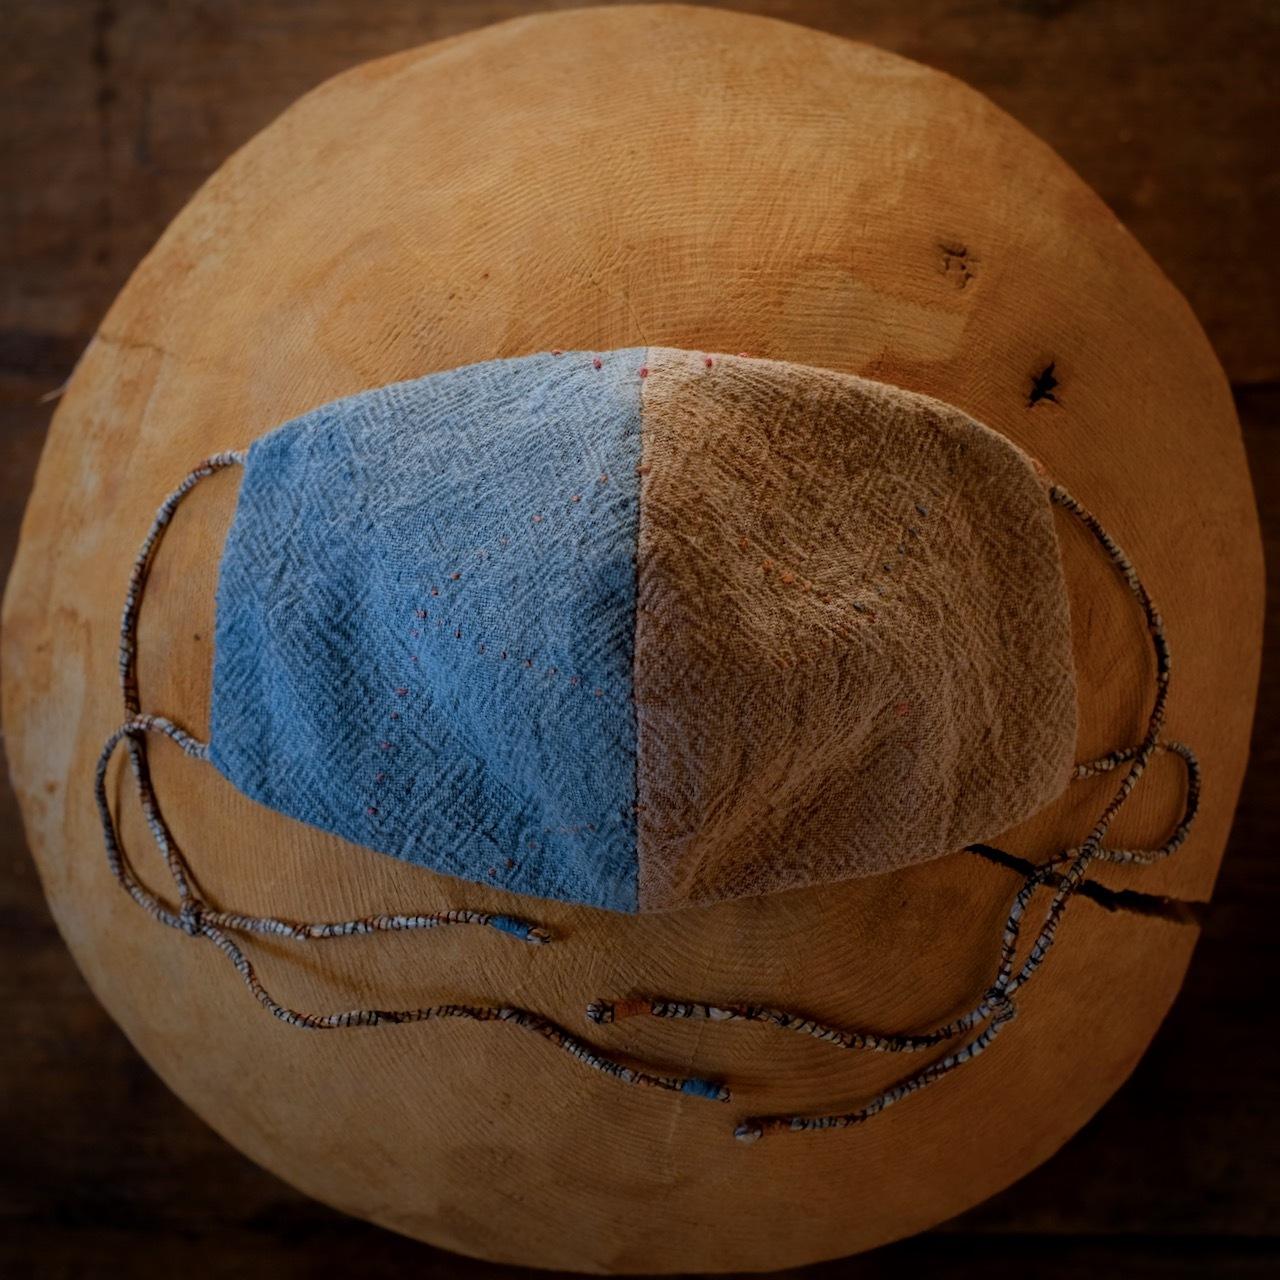 anima mask #76「transformation 変容 7」草木染め木綿とびわ染竹布 男性サイズ